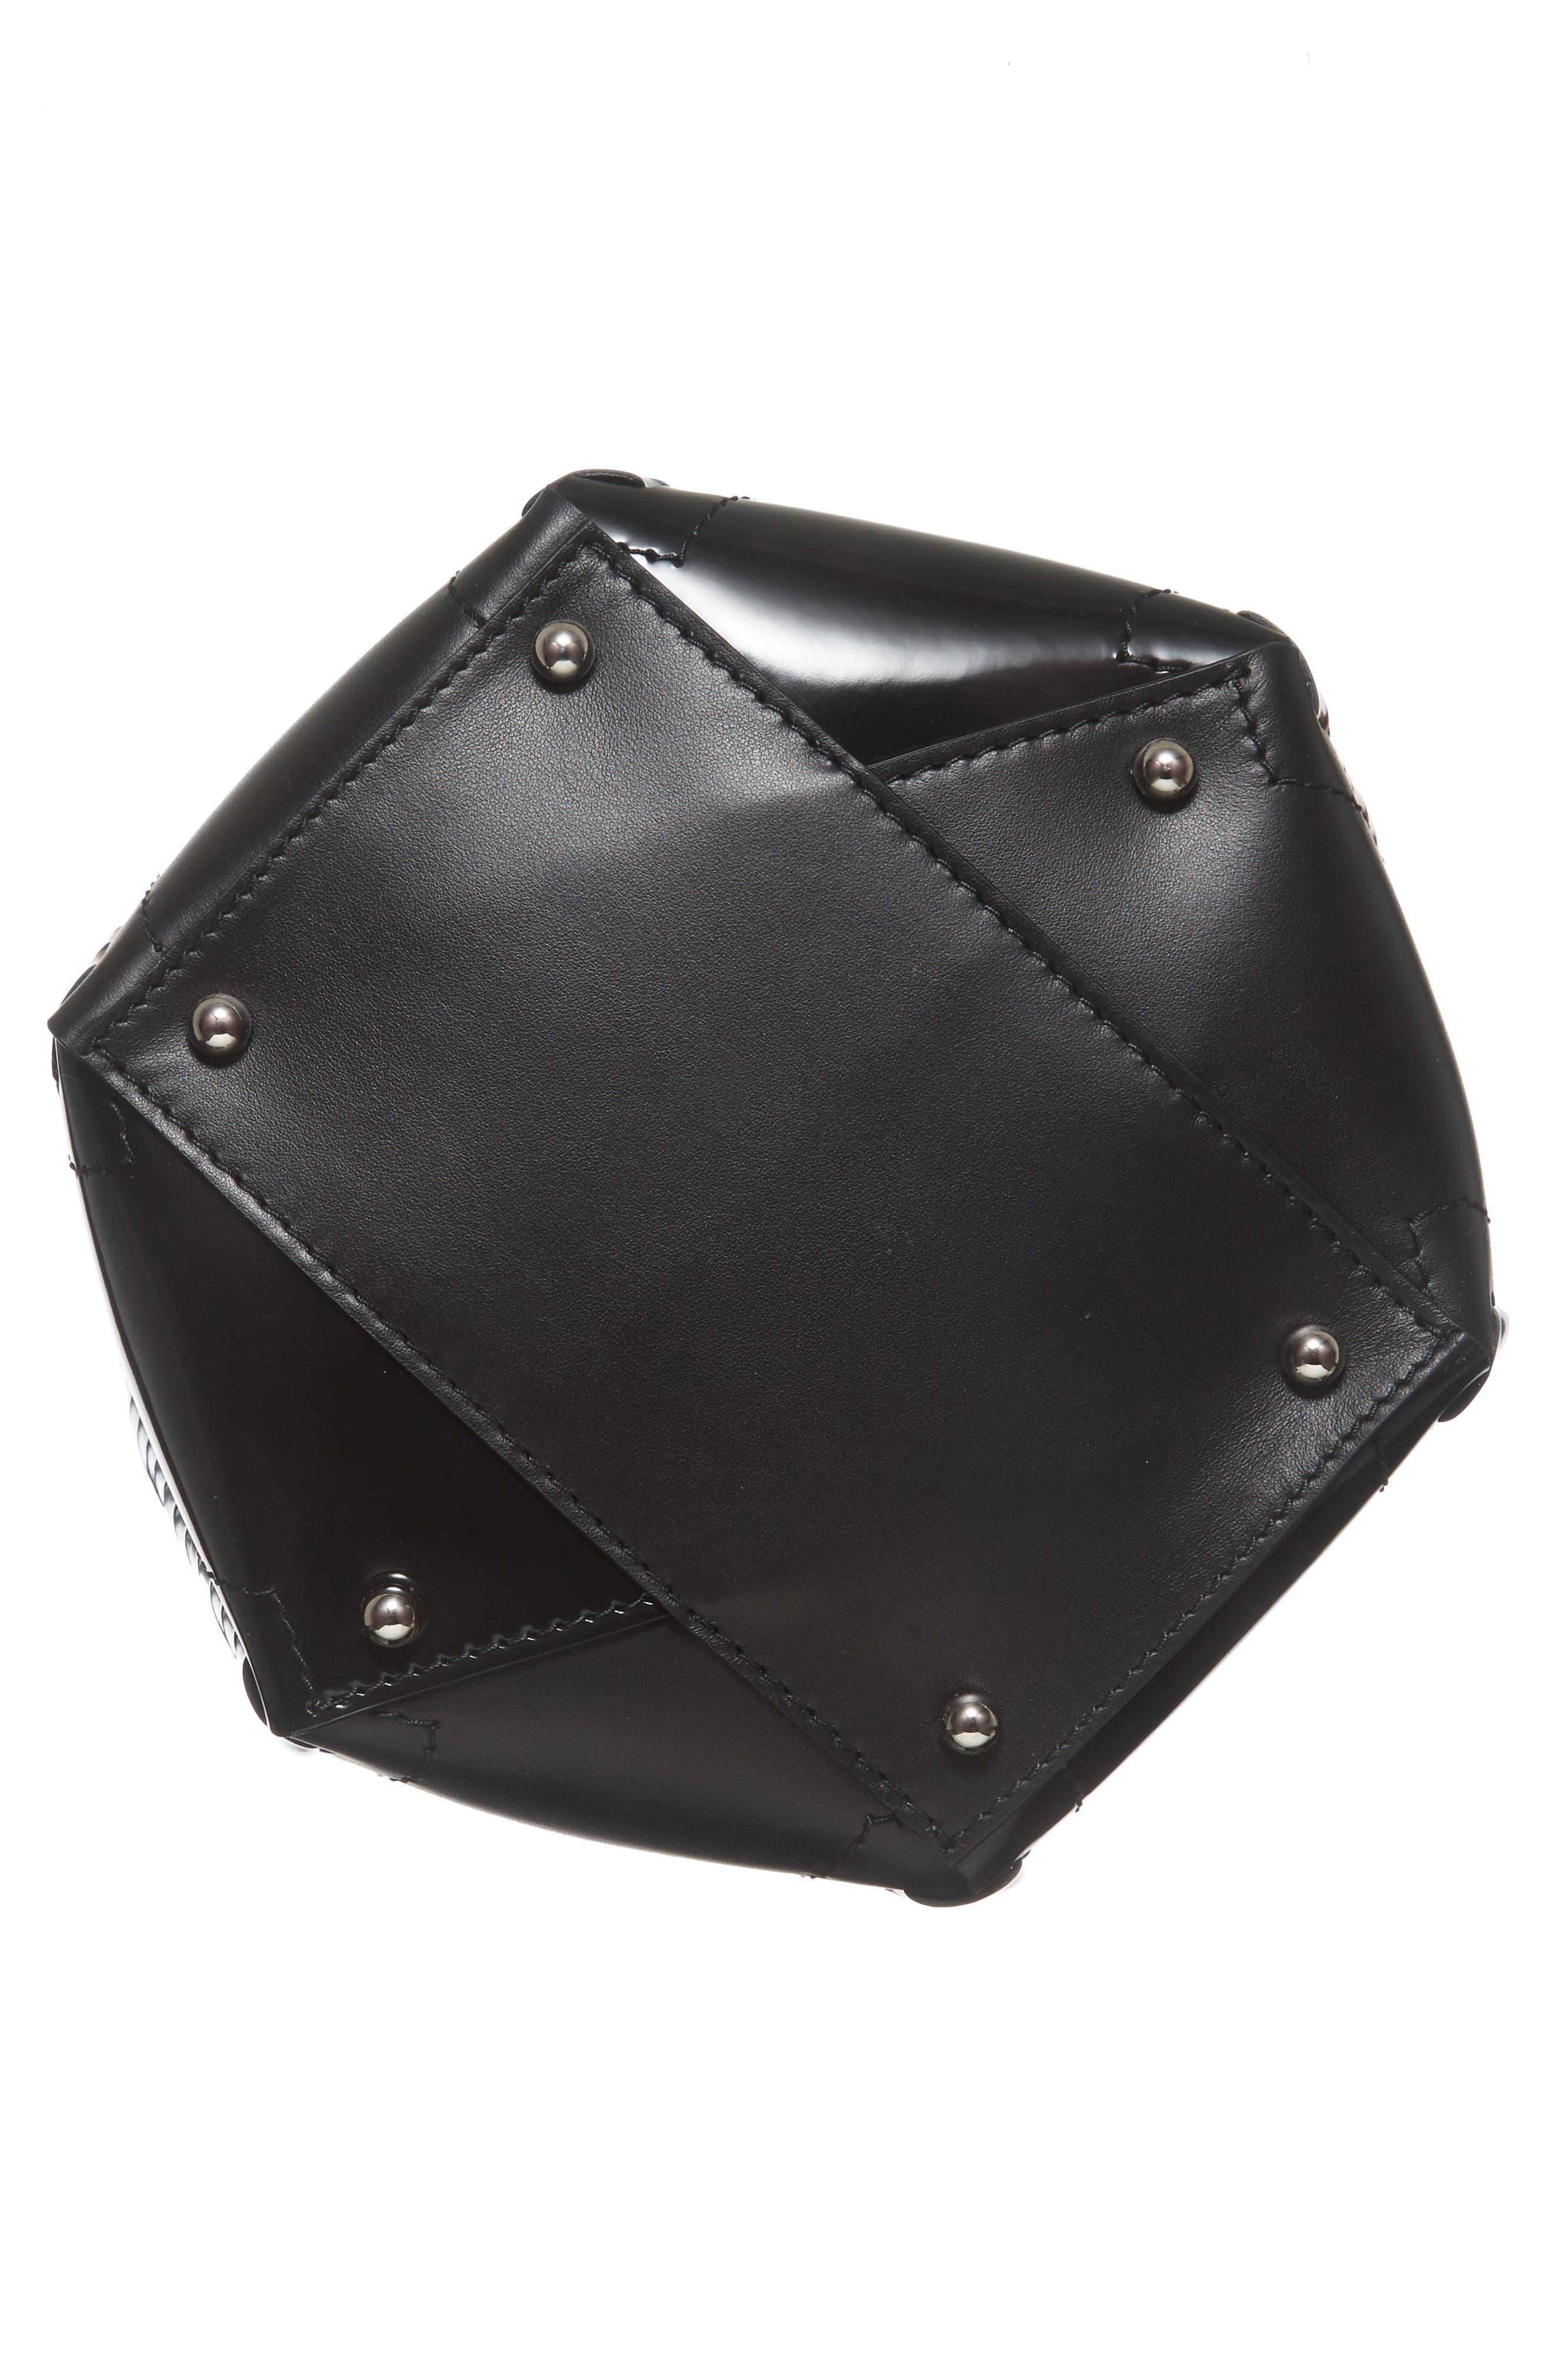 Medium Hex Metallic Whipstitch Leather Bucket Bag,                             Alternate thumbnail 4, color,                             Black Mix